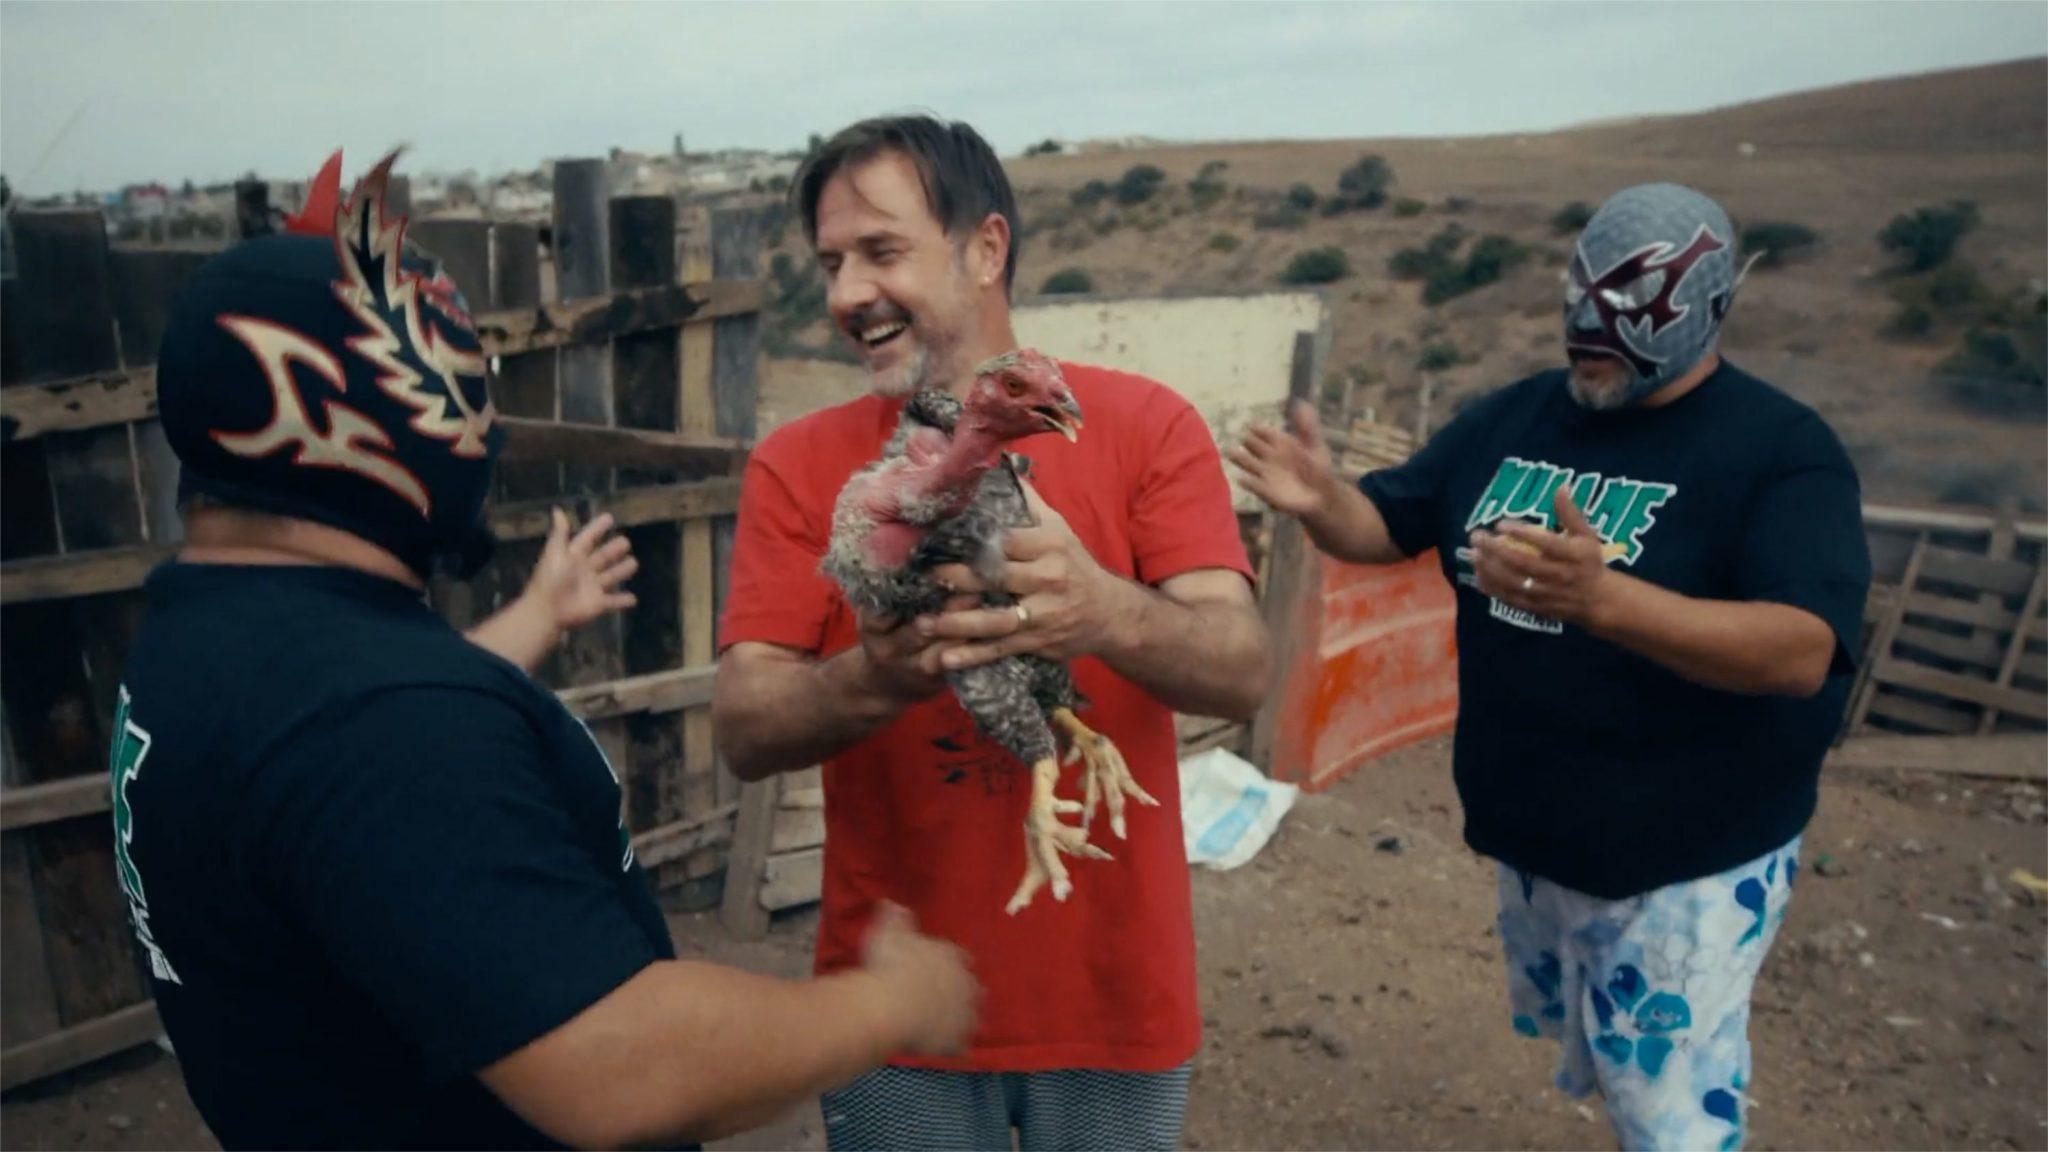 You Cannot Kill David Arquette image film poulet